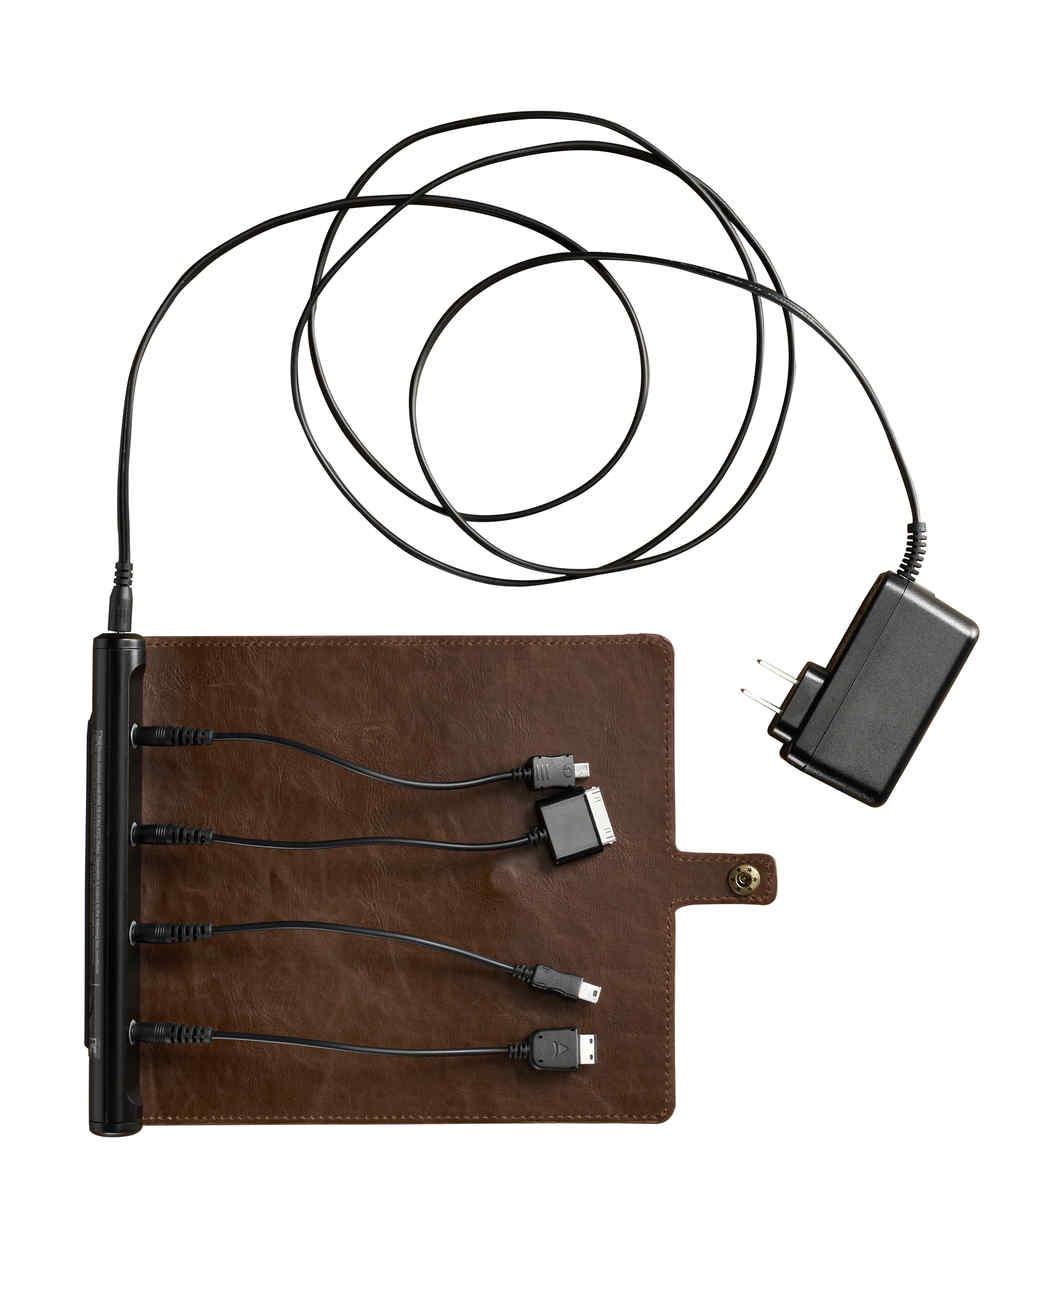 restoration-hardware-roll-up-travel-charger.jpg